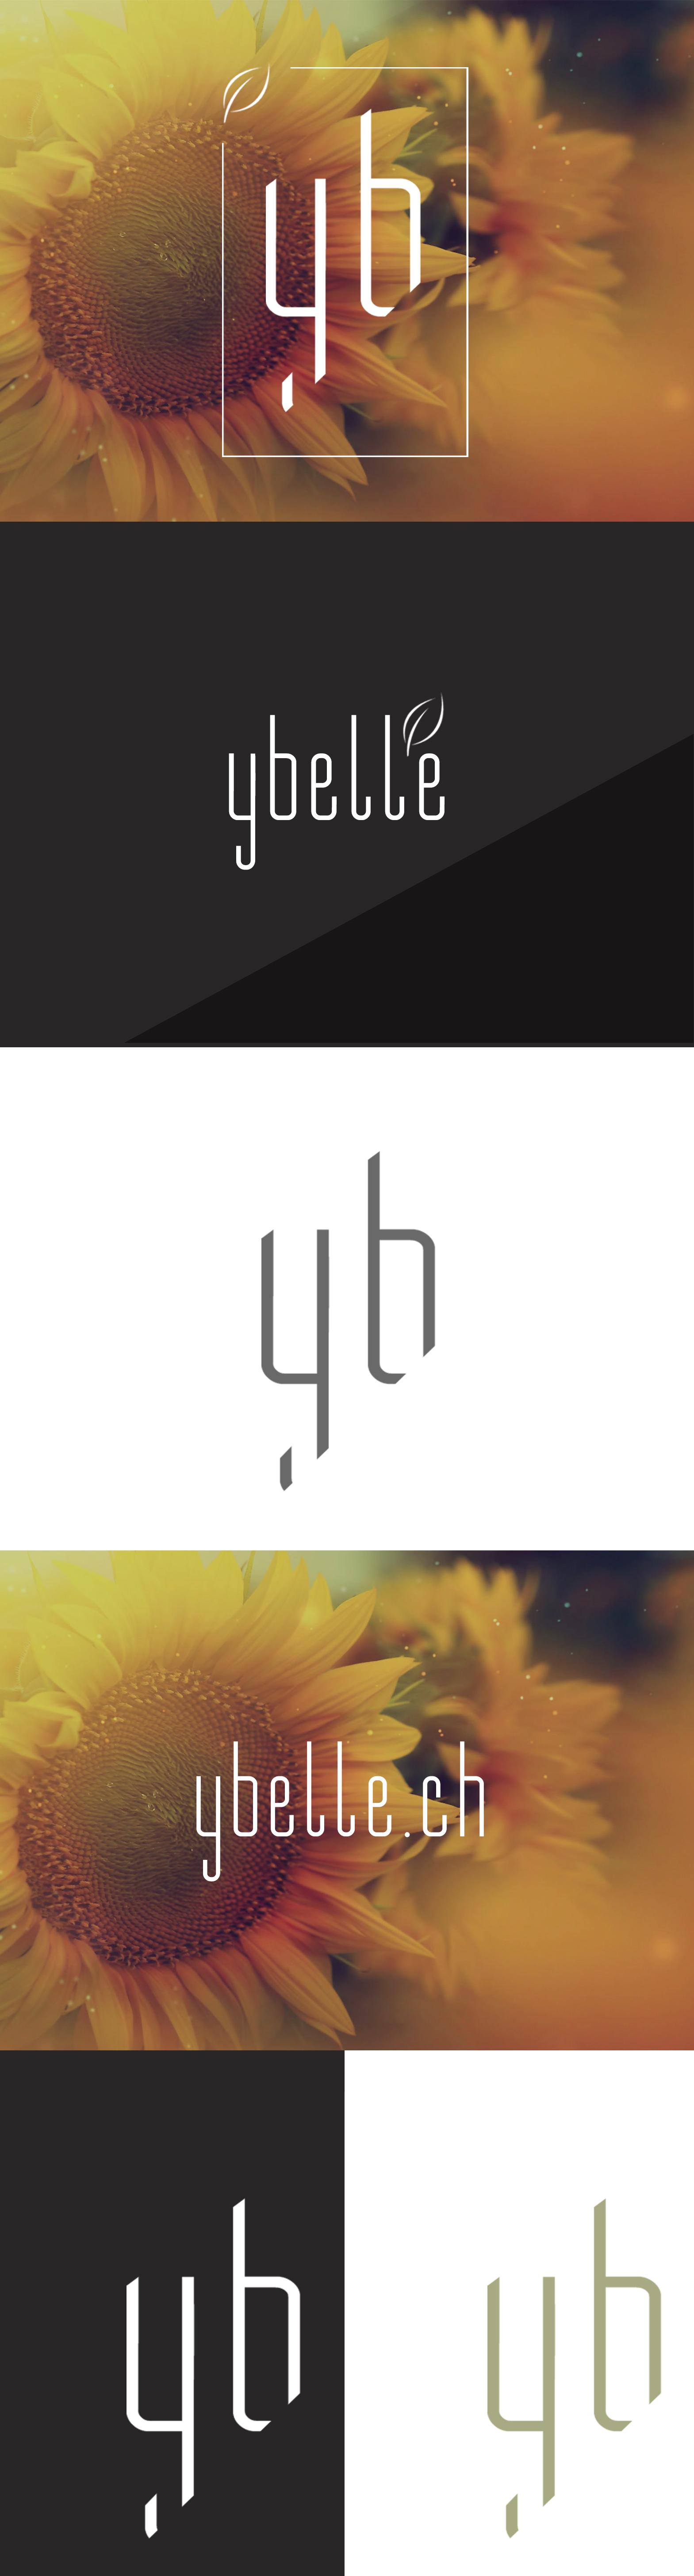 ybelle_logo